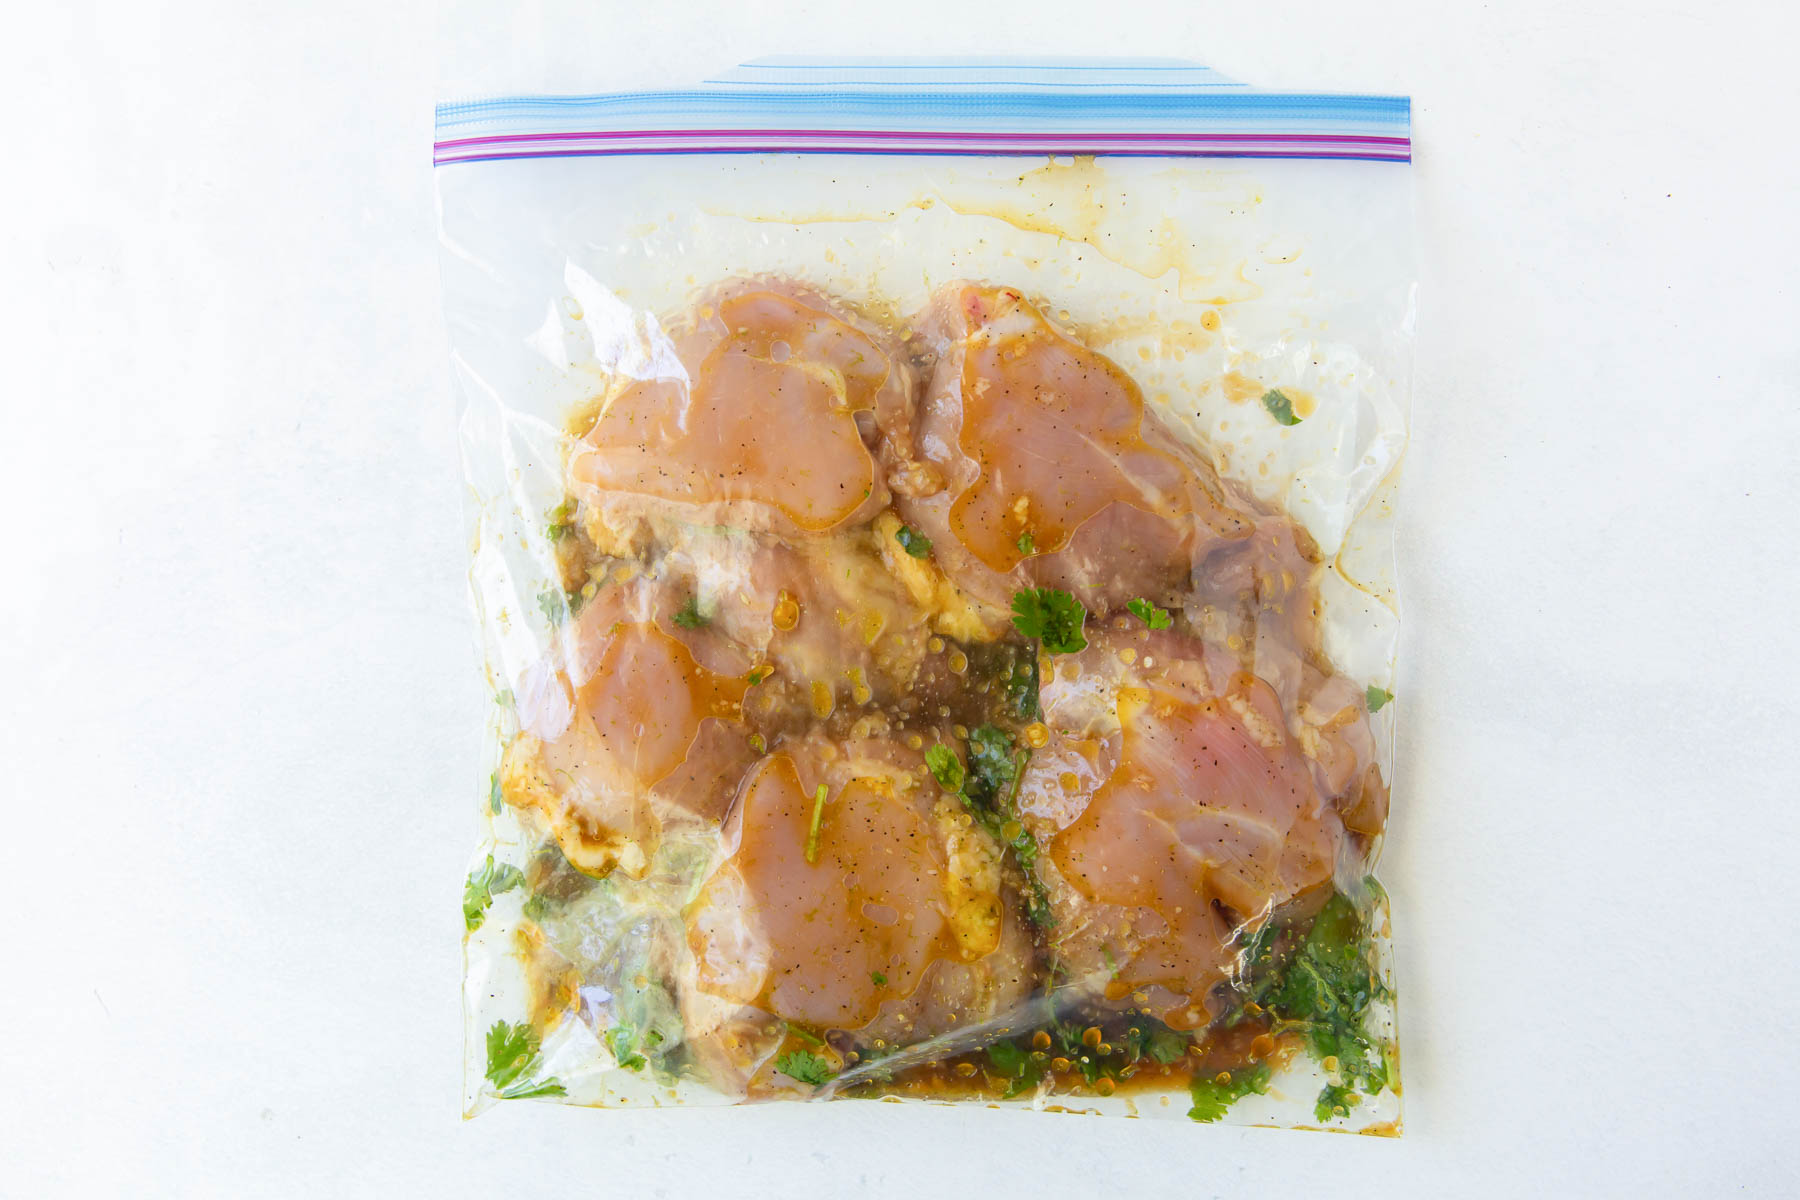 chicken and marinade in a zip-top plastic bag